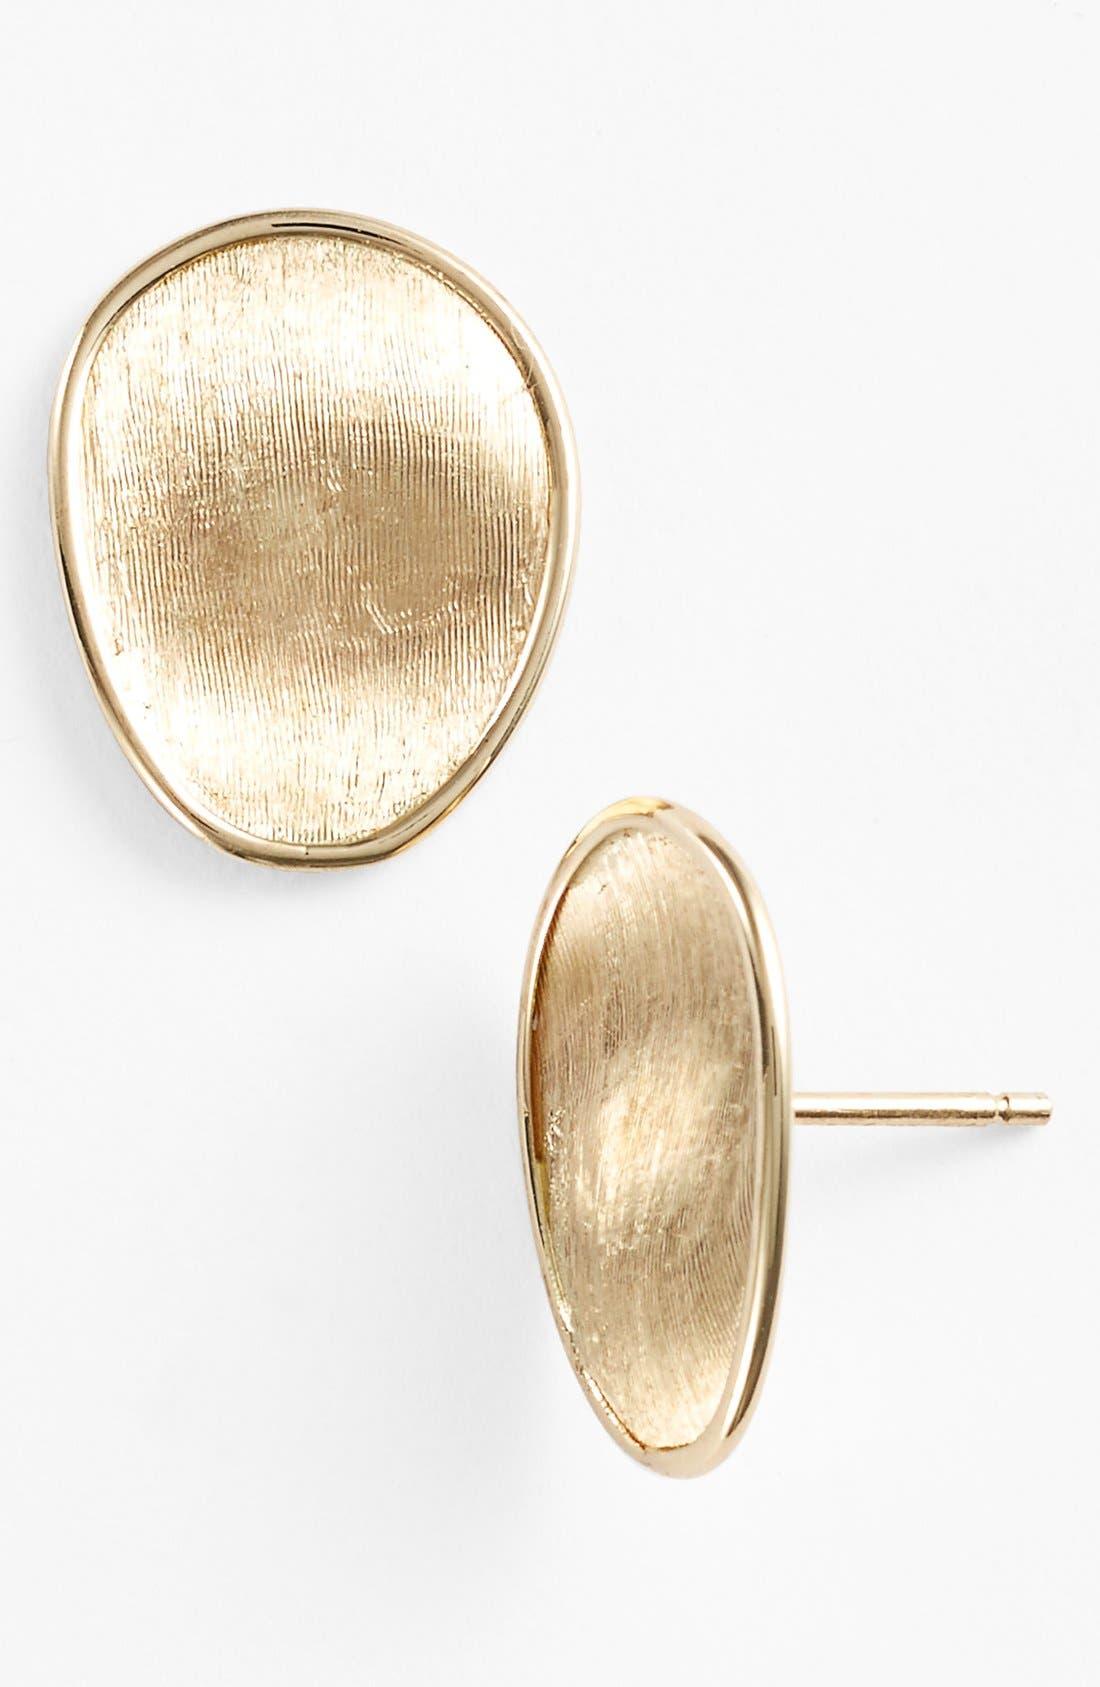 'Lunaria' Stud Earrings,                             Main thumbnail 1, color,                             YELLOW GOLD